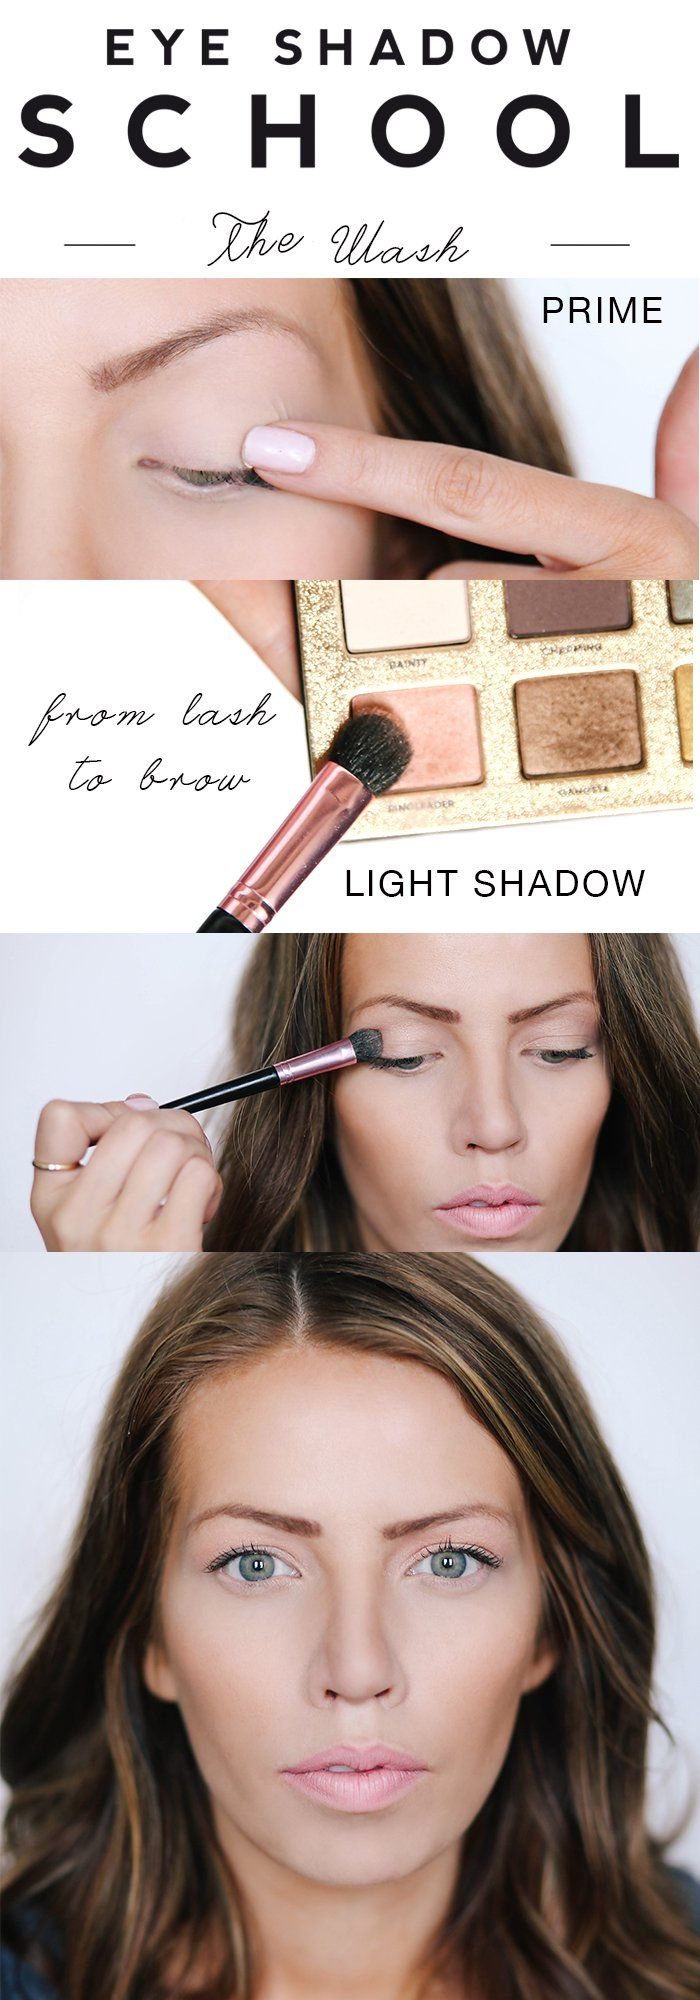 The absolute easiest ways to apply eyeshadow!